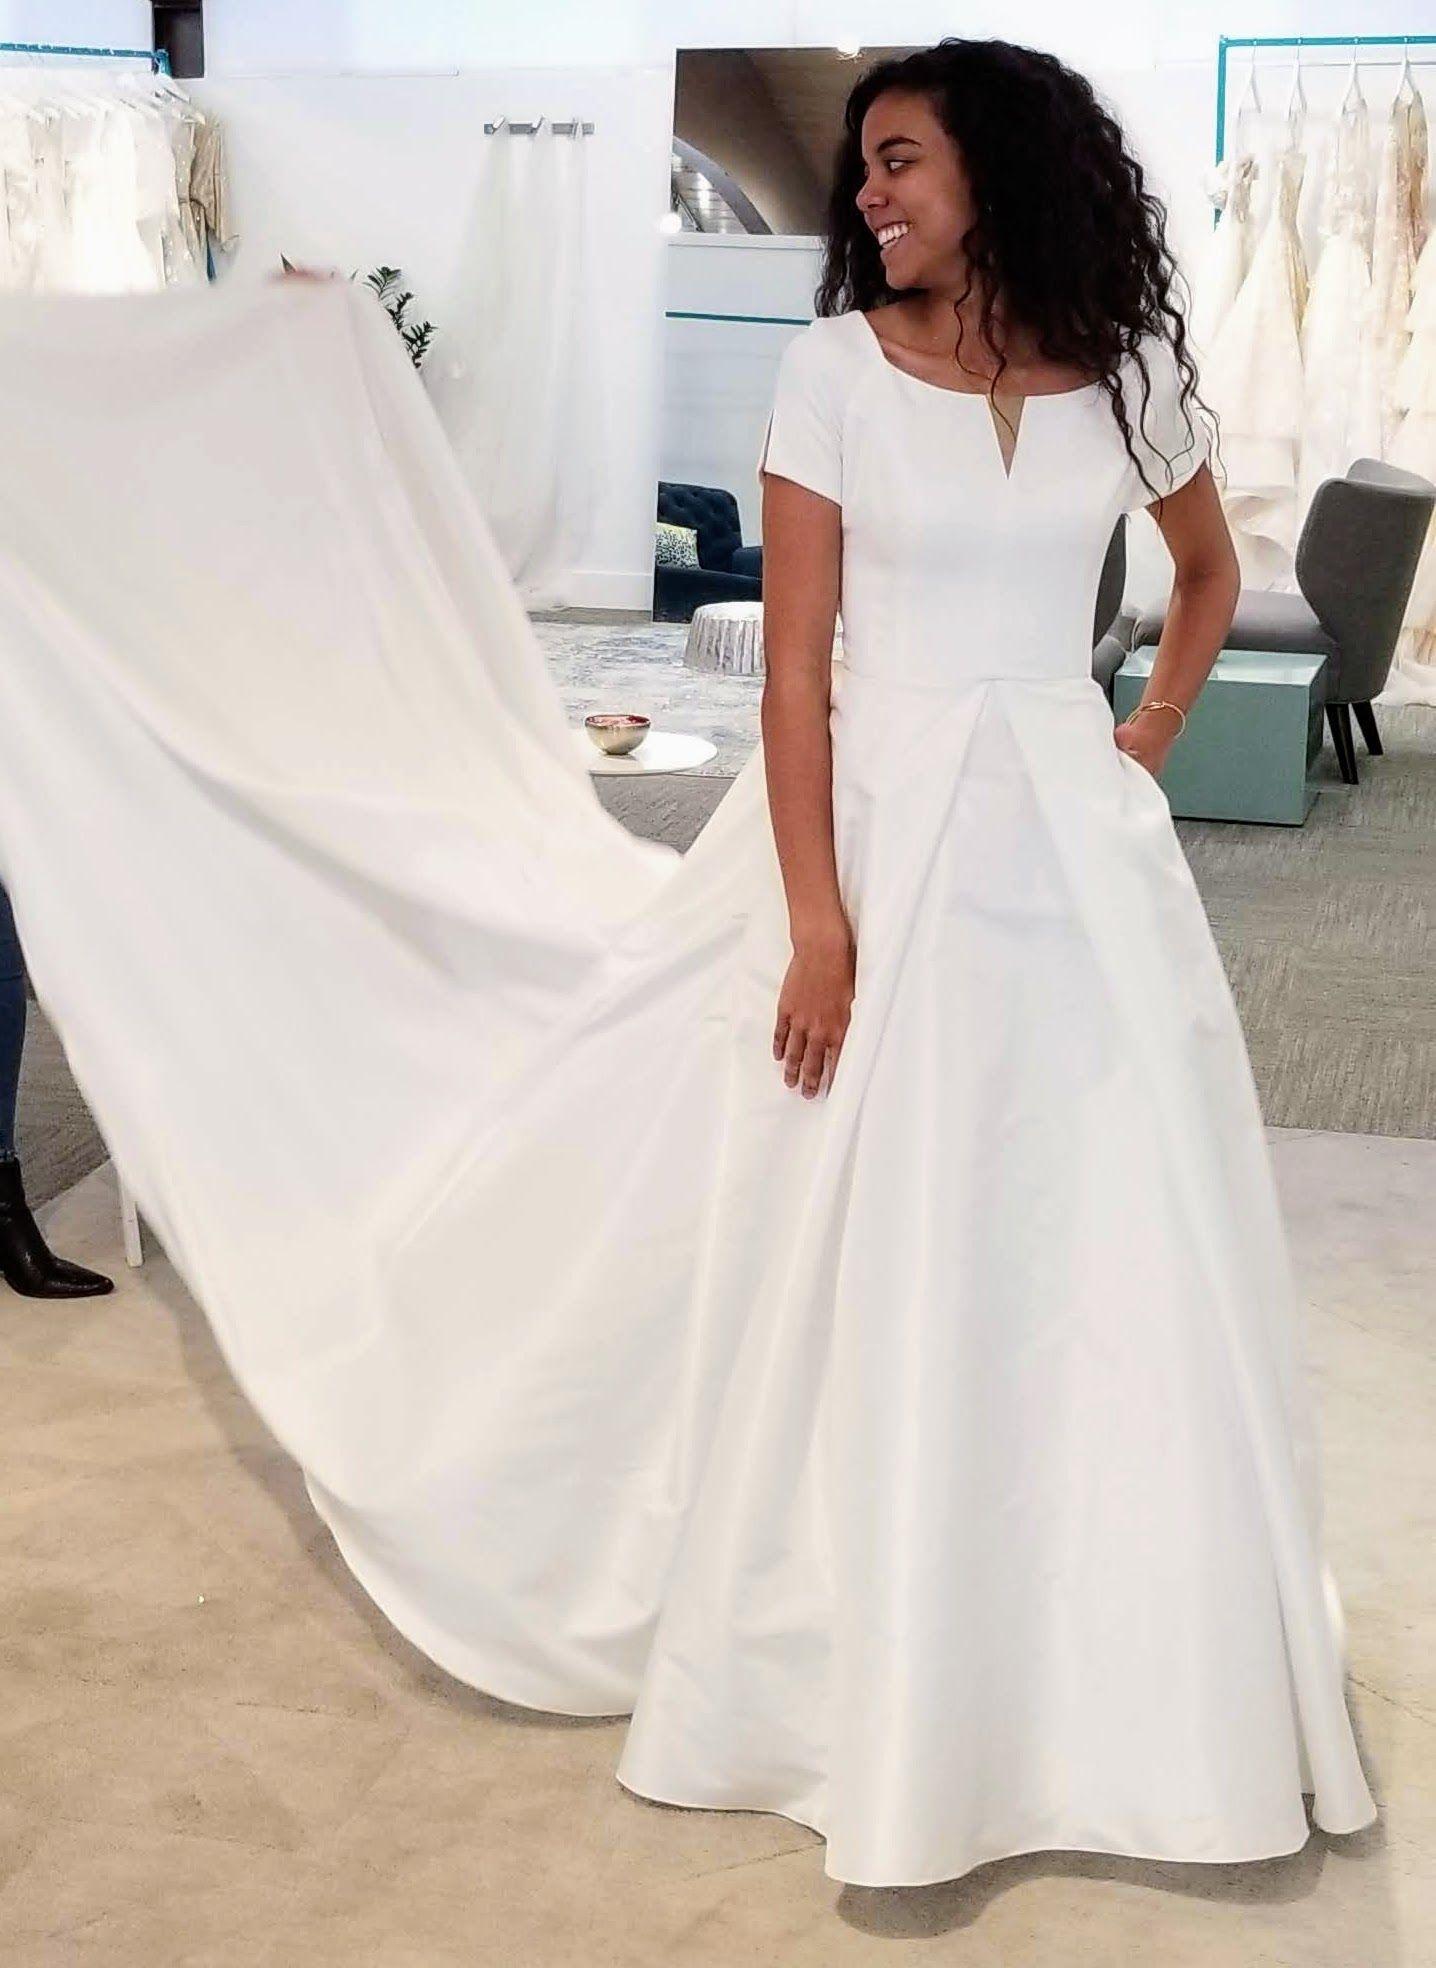 Alta Moda Moest Wedding Dress With Pockets And A Long Train Utah Bridal Shop A In 2020 Wedding Dress With Pockets Customizable Wedding Dress Modest Wedding Dresses